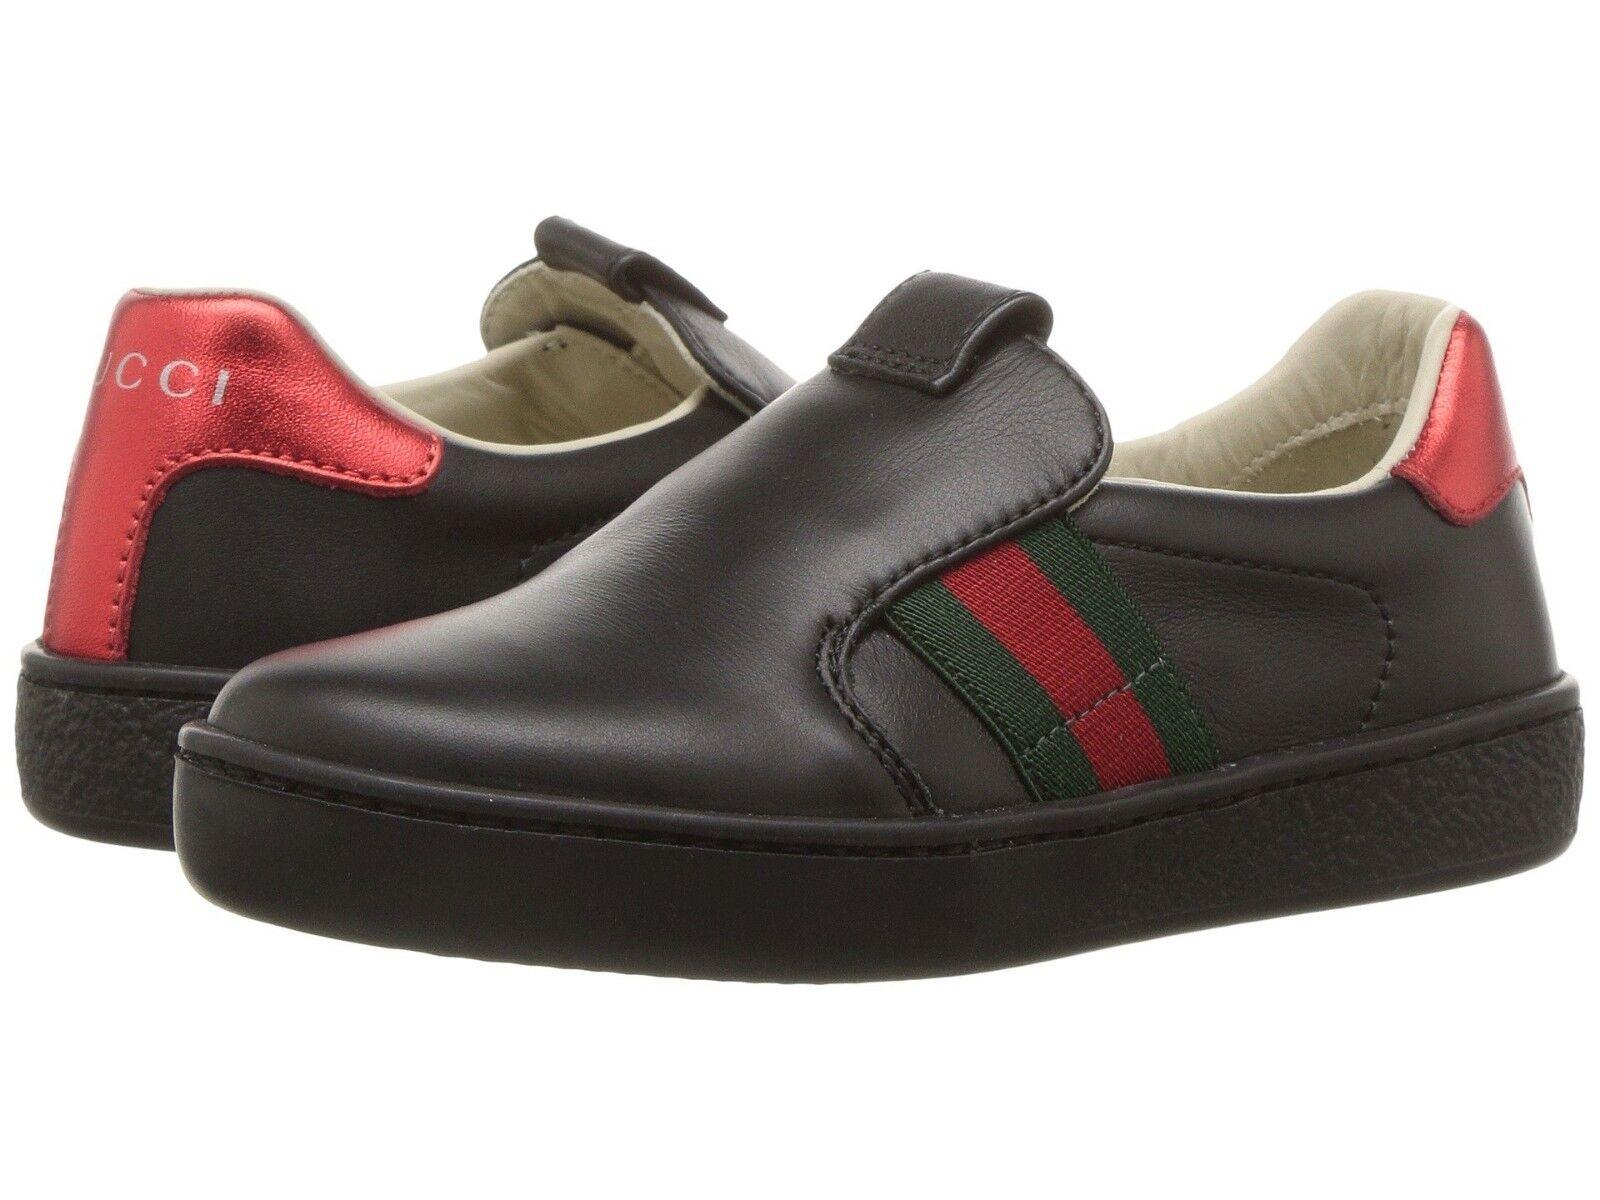 NIB NEW Gucci Ace kids boys girls black leather sneakers slip on 26 10 477539